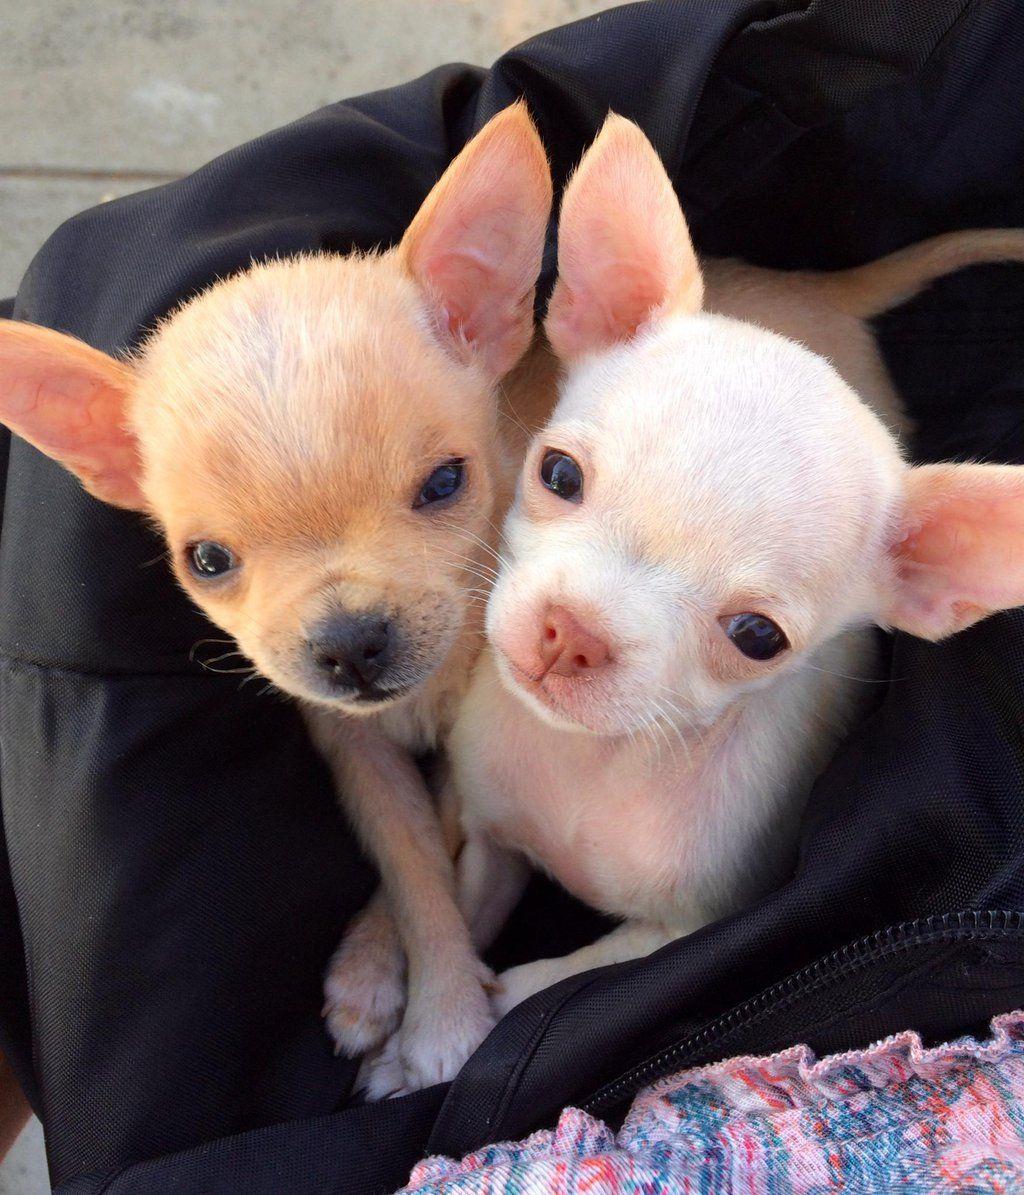 Gayweho Dogs 4 U On Chihuahua Puppies Baby Chihuahua Chihuahua